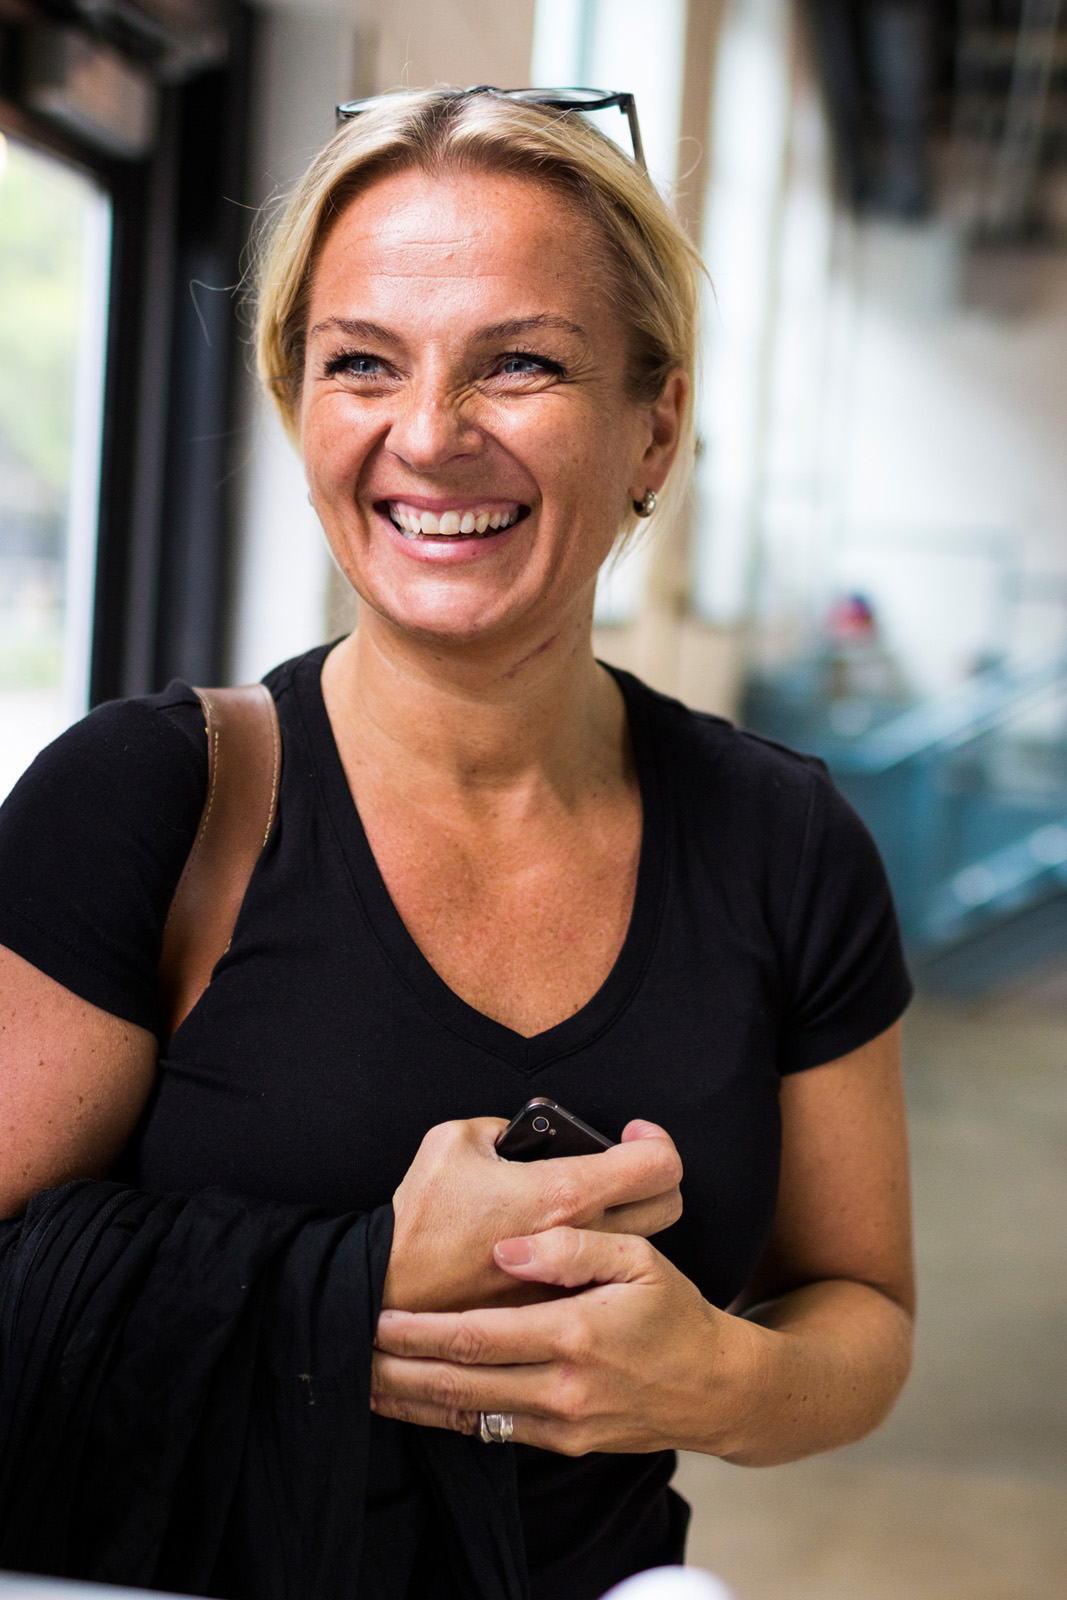 GlassLab designer Sigga Heimis at The Studio, August 2013